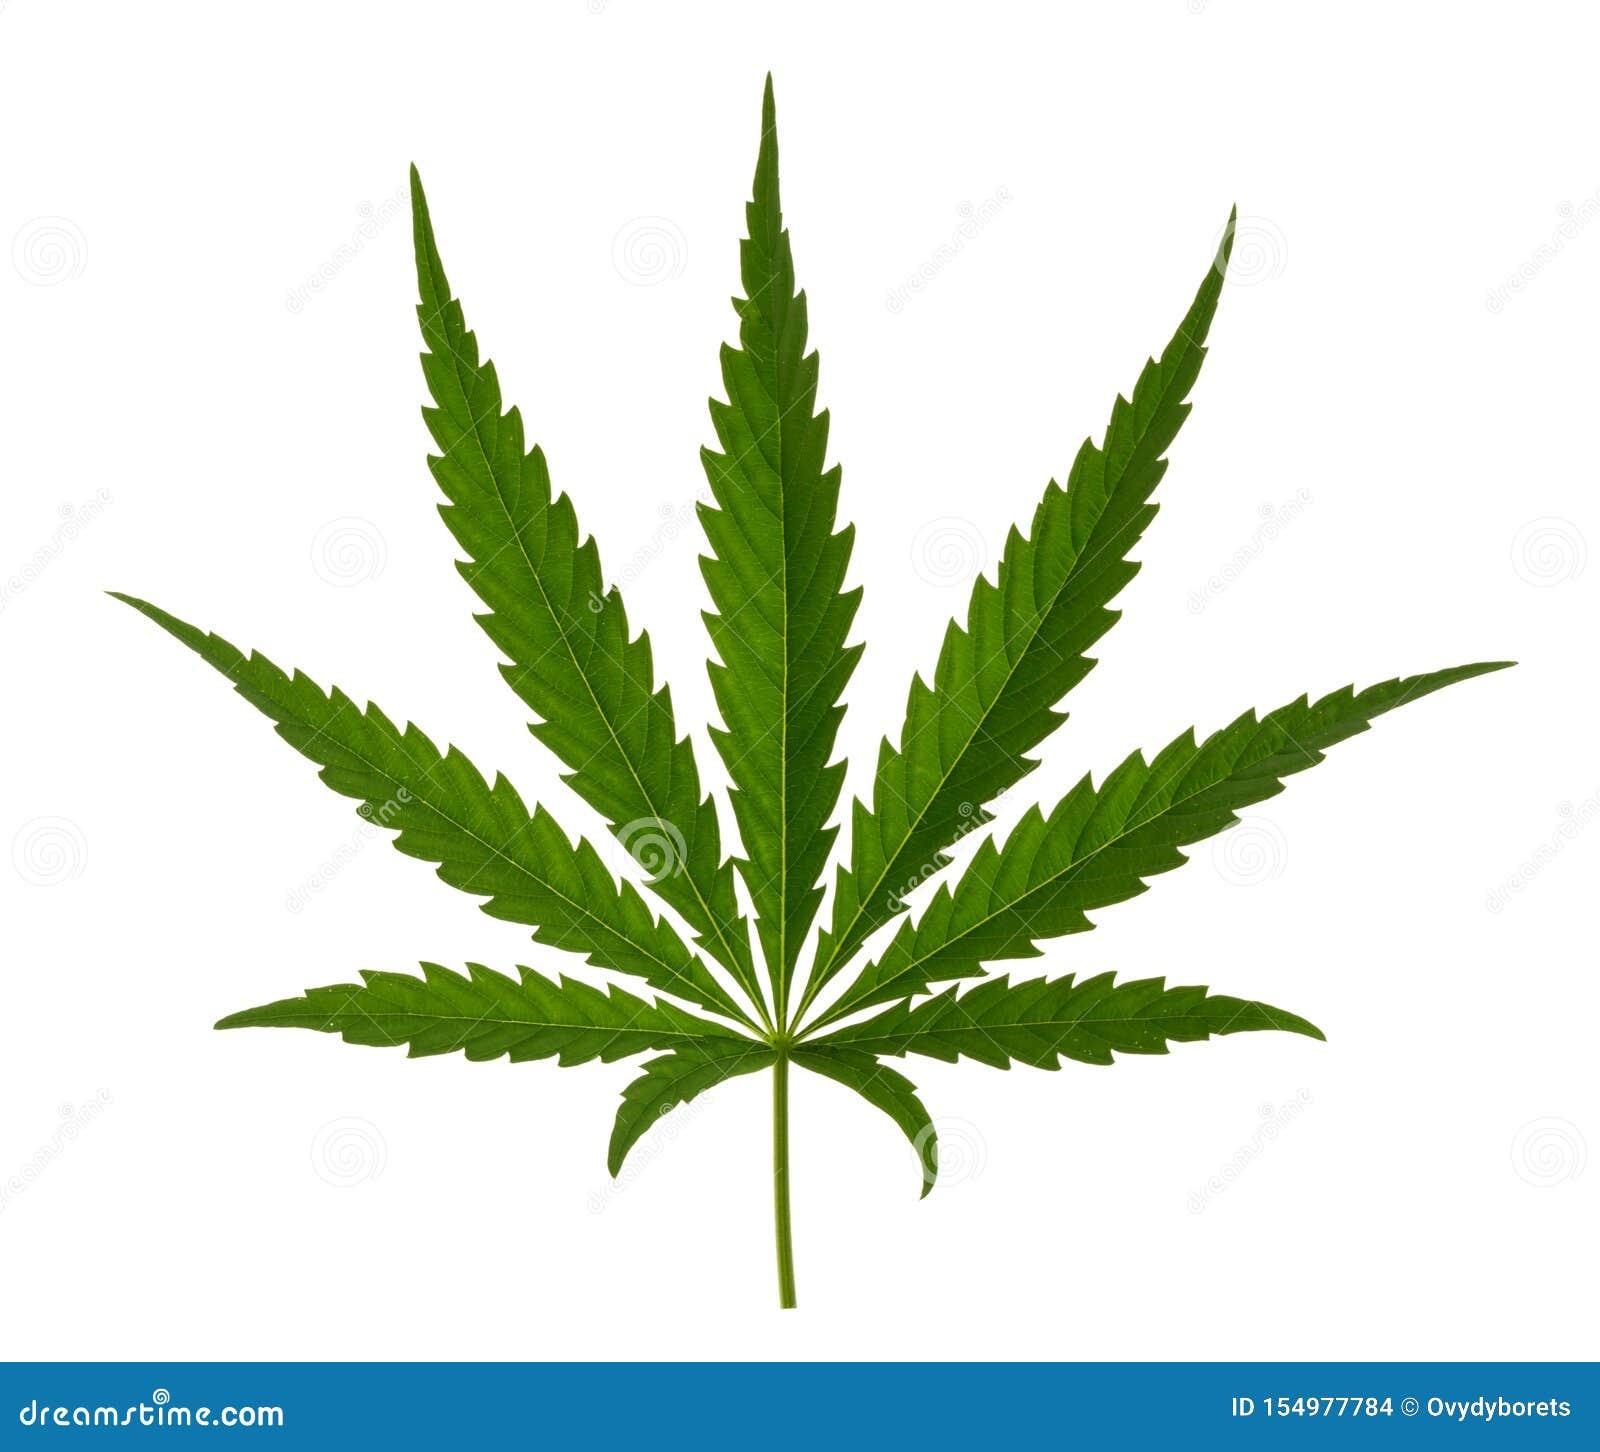 Folha da marijuana isolada no branco sem sombra